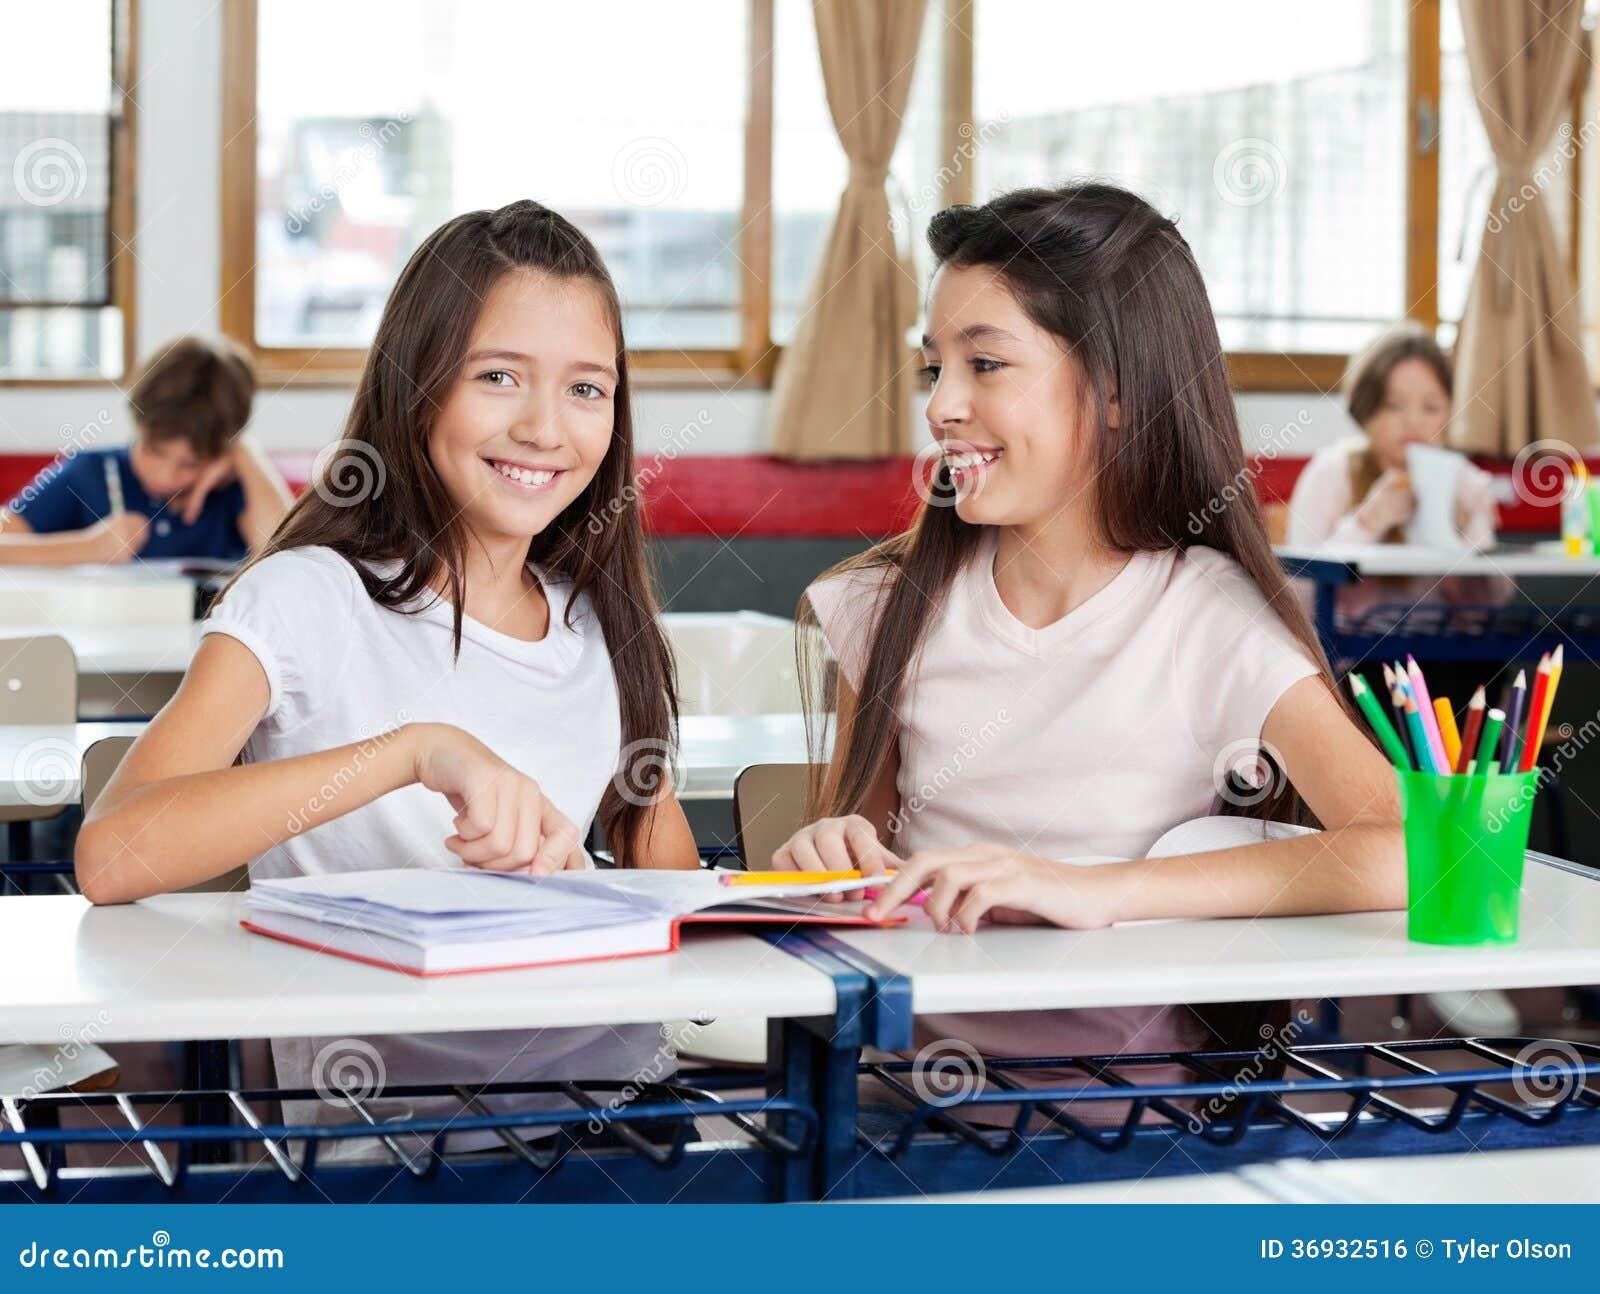 Happy Schoolgirl Sitting With Friend At Desk